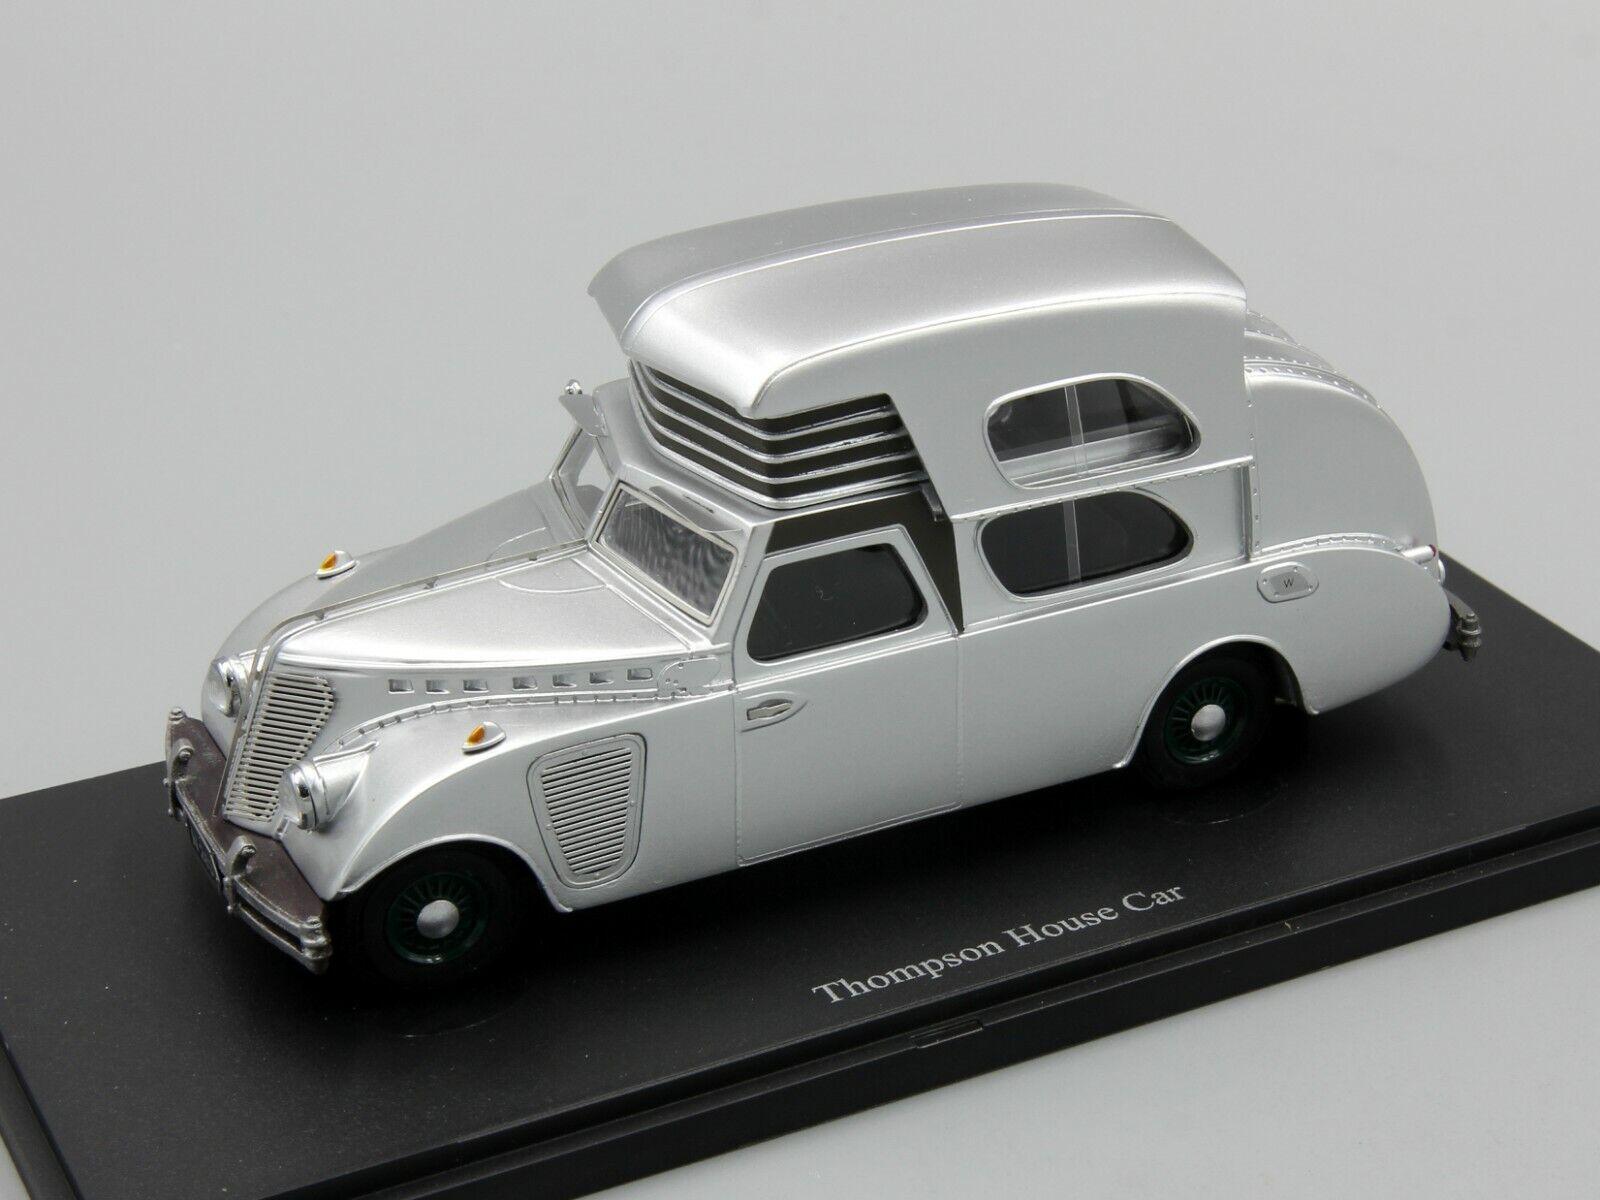 Autocult 1 43 Thompson Casa Coche, argento metálica, USA, 1934